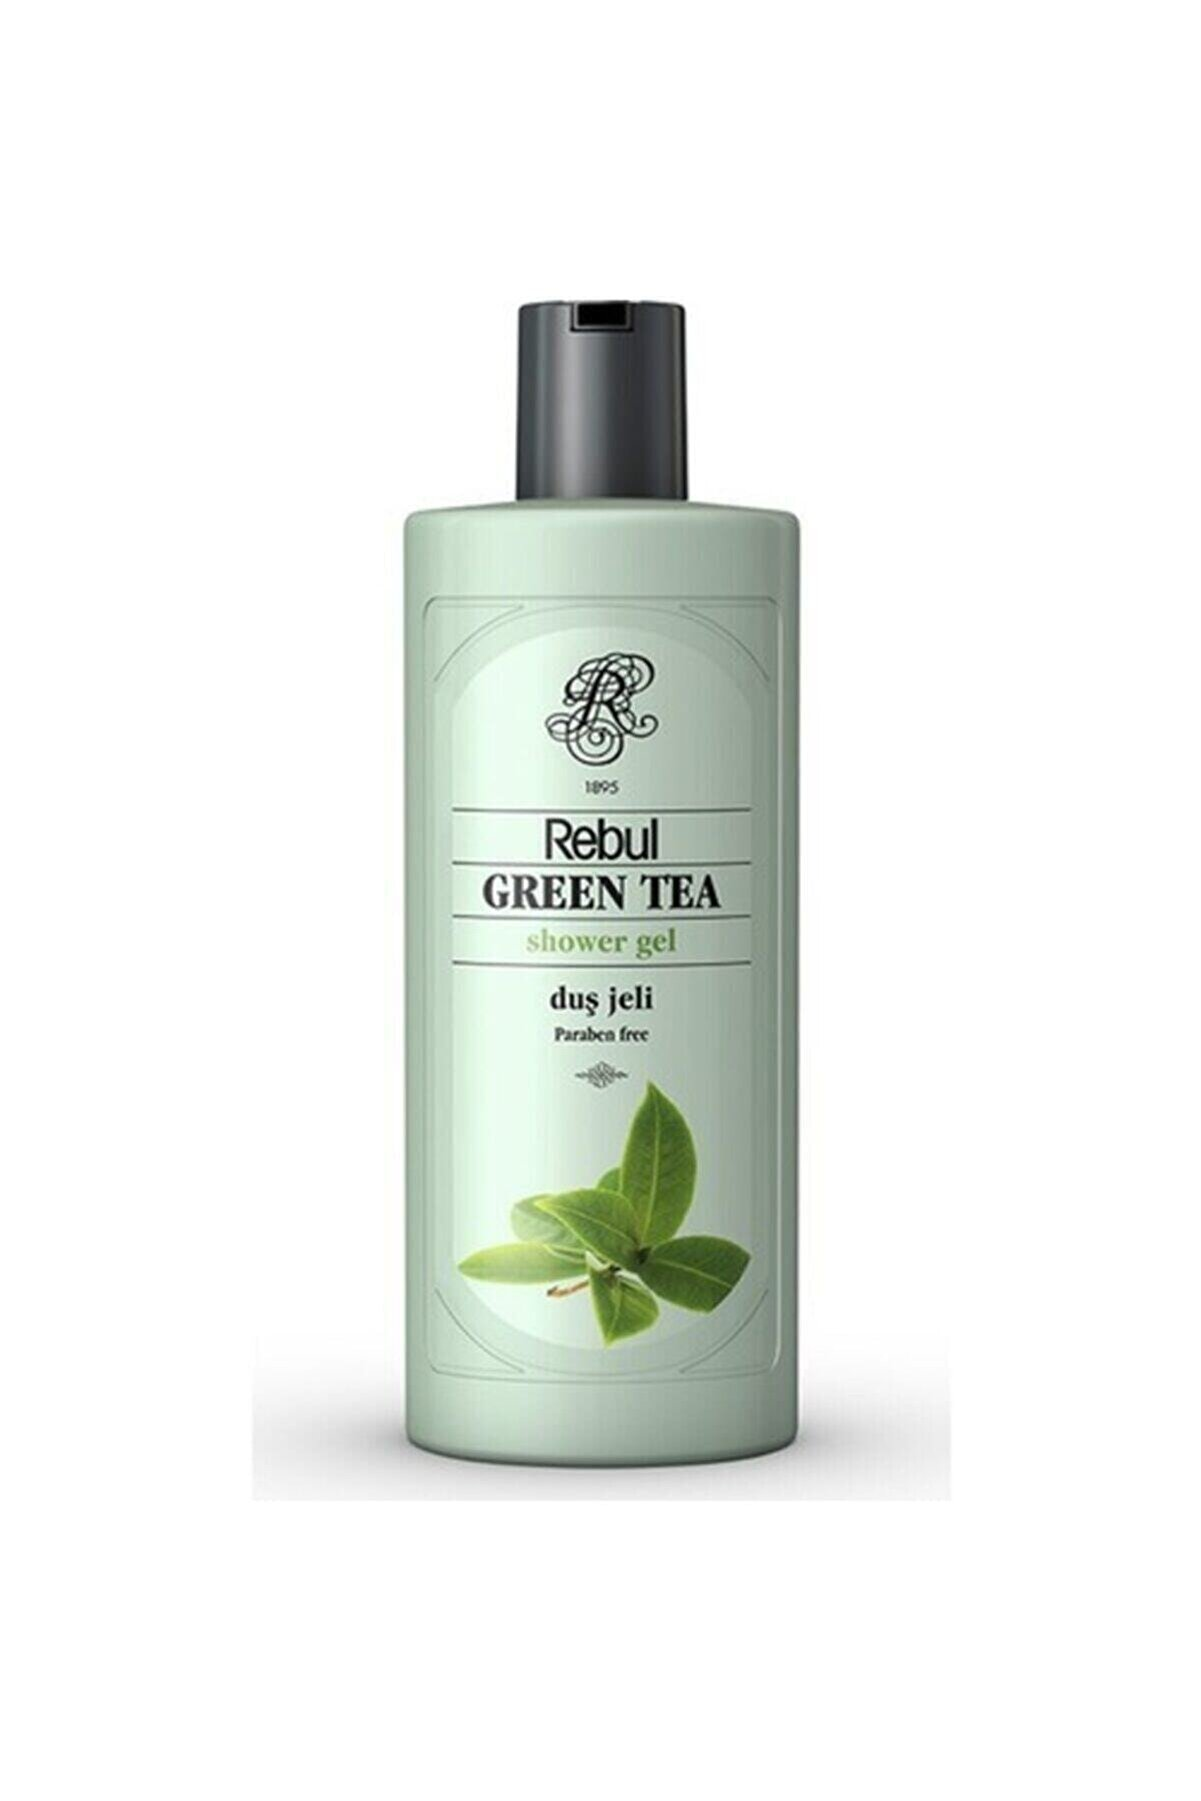 Rebul Green Tea Duş Jeli 450 ml